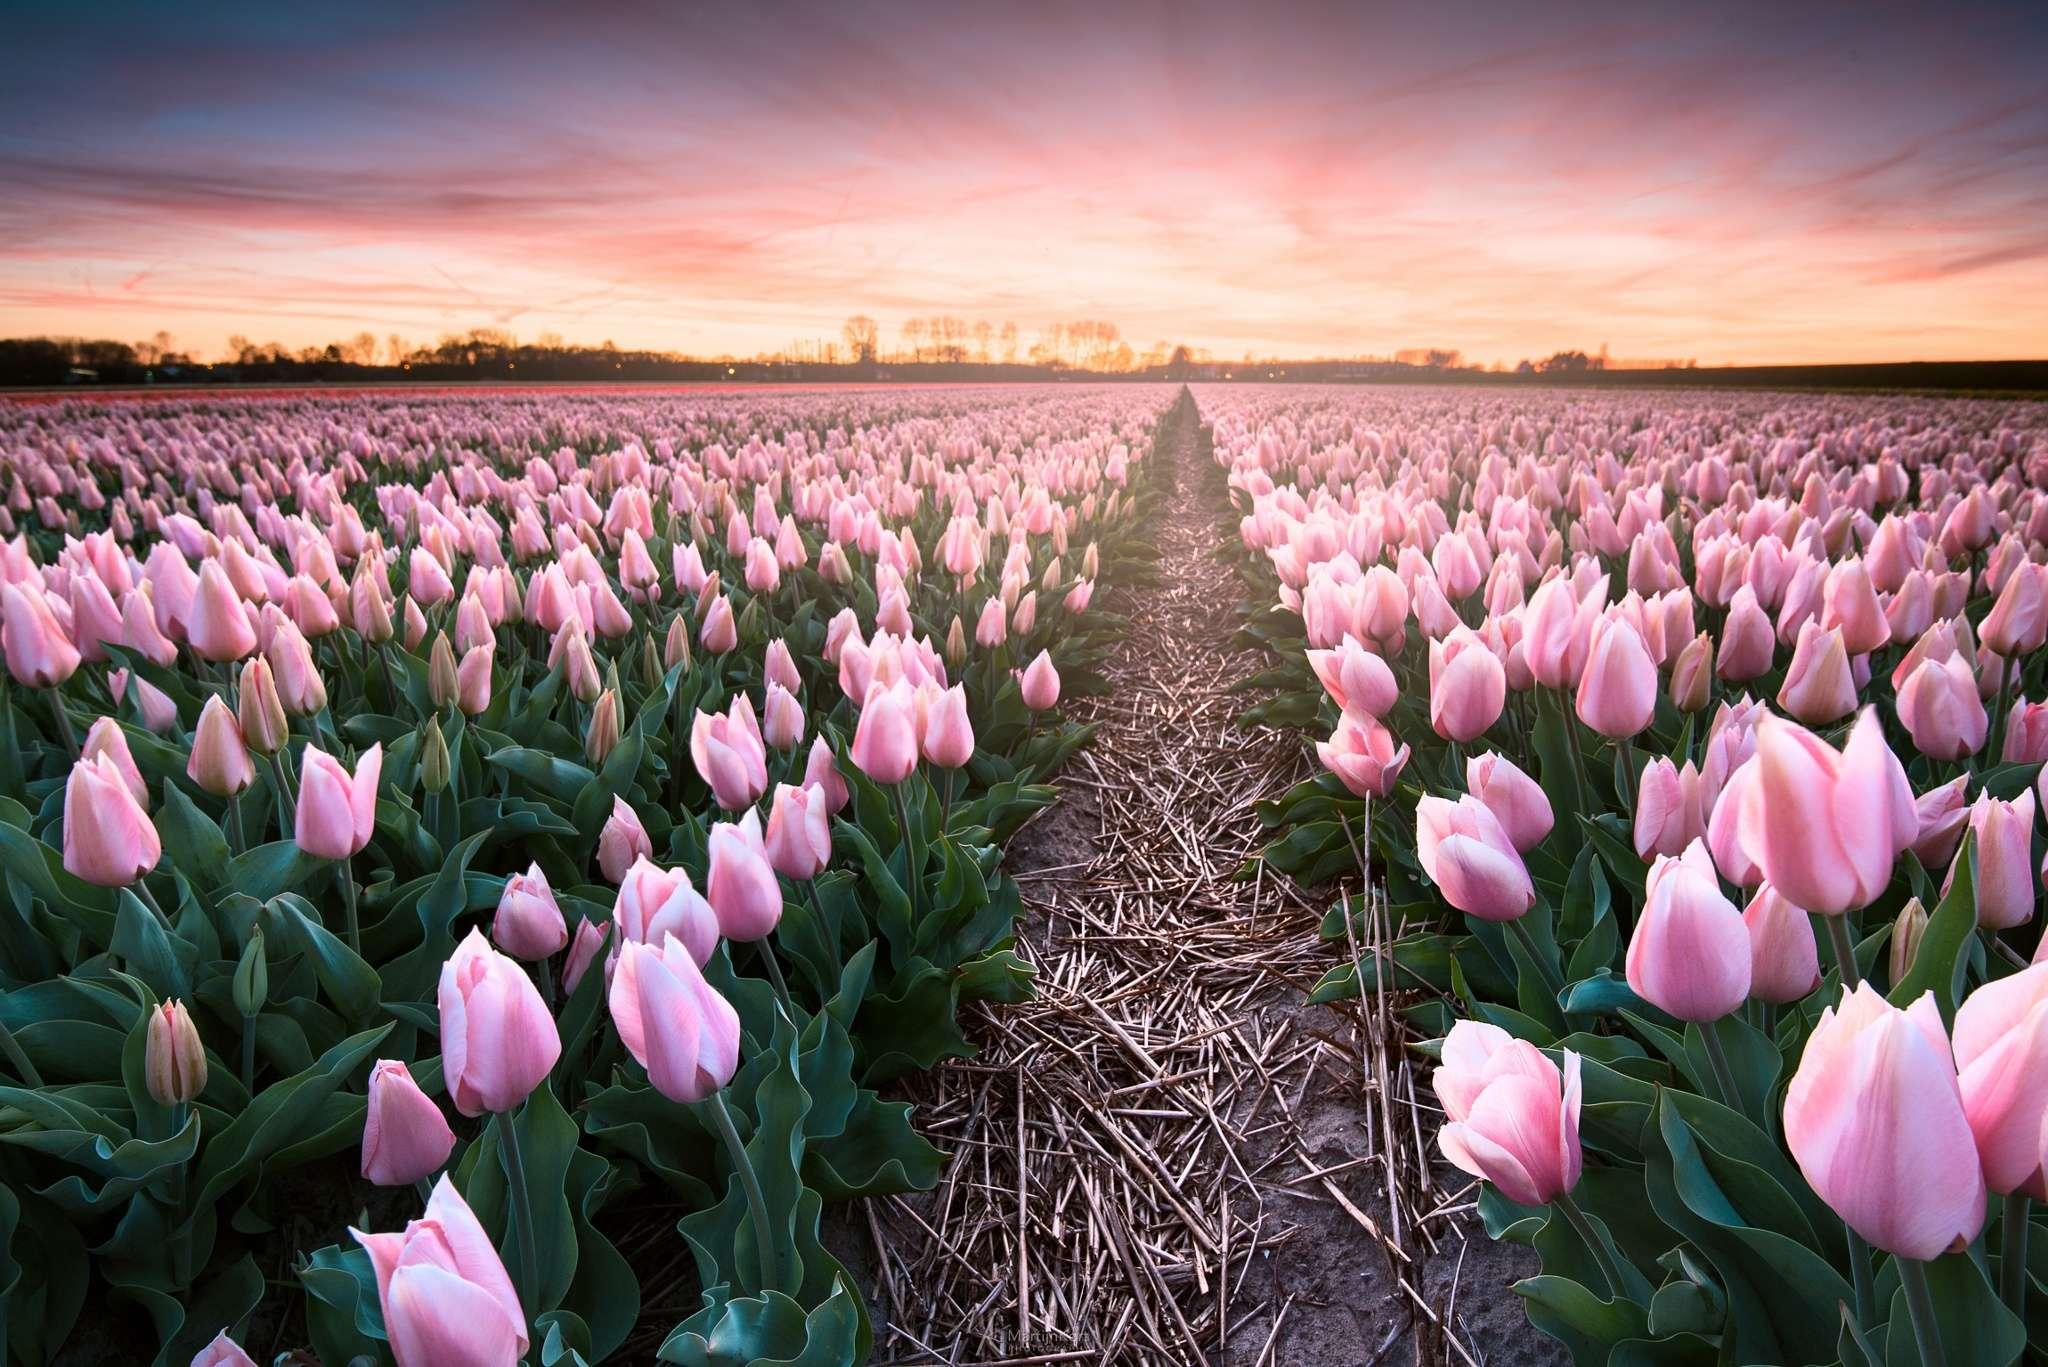 Hình nền hoa tulip đẹp